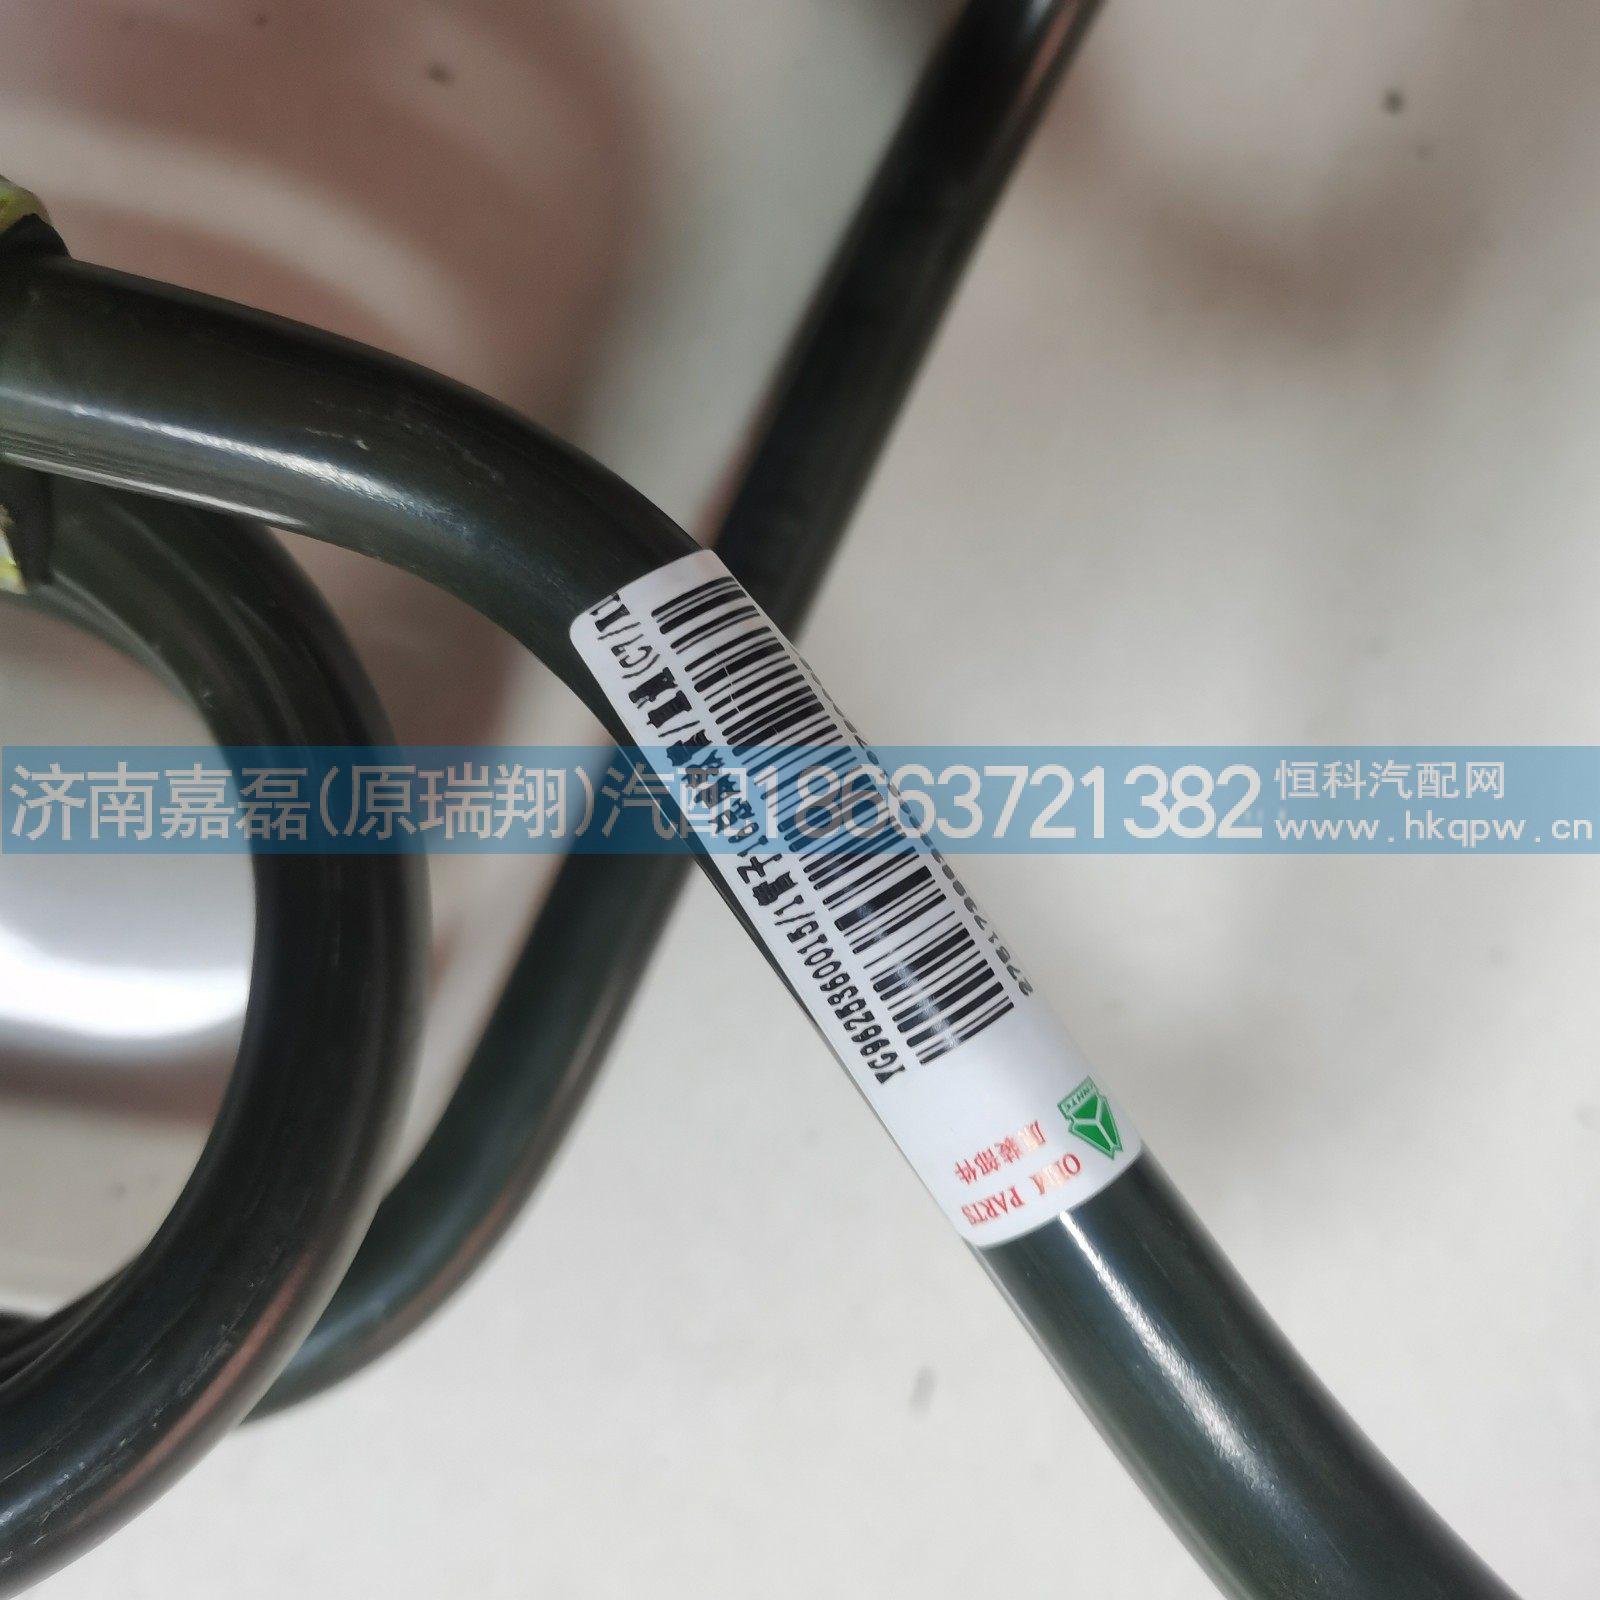 YG9625360015管子16总成软管/YG9625360015管子16总成软管